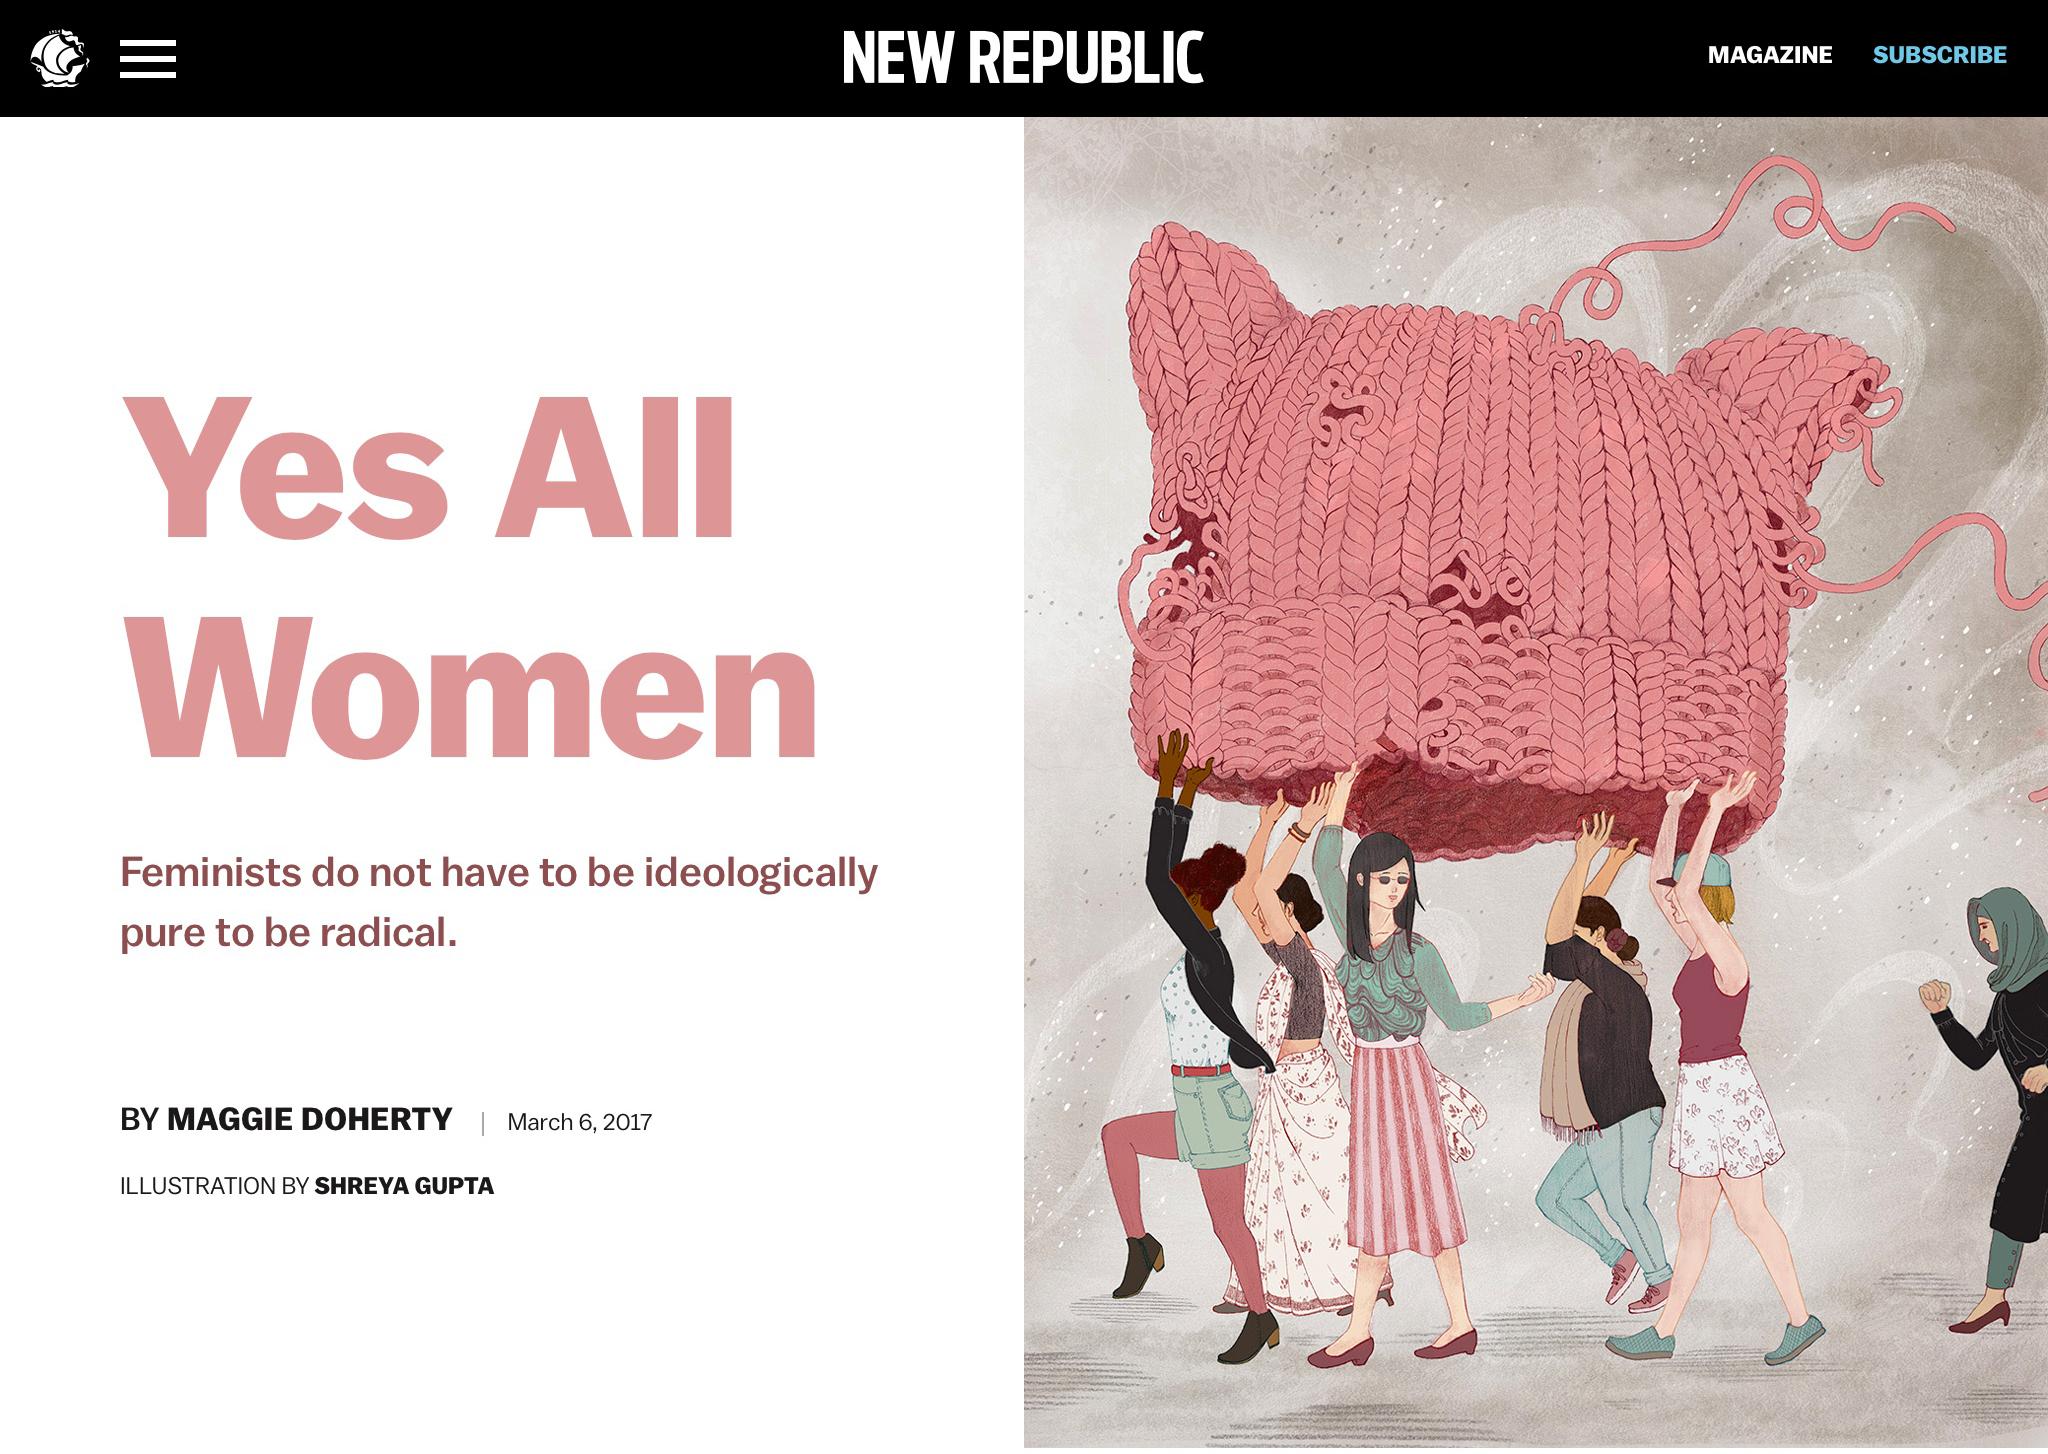 NEW REPUBLIC- YES ALL WOMEN